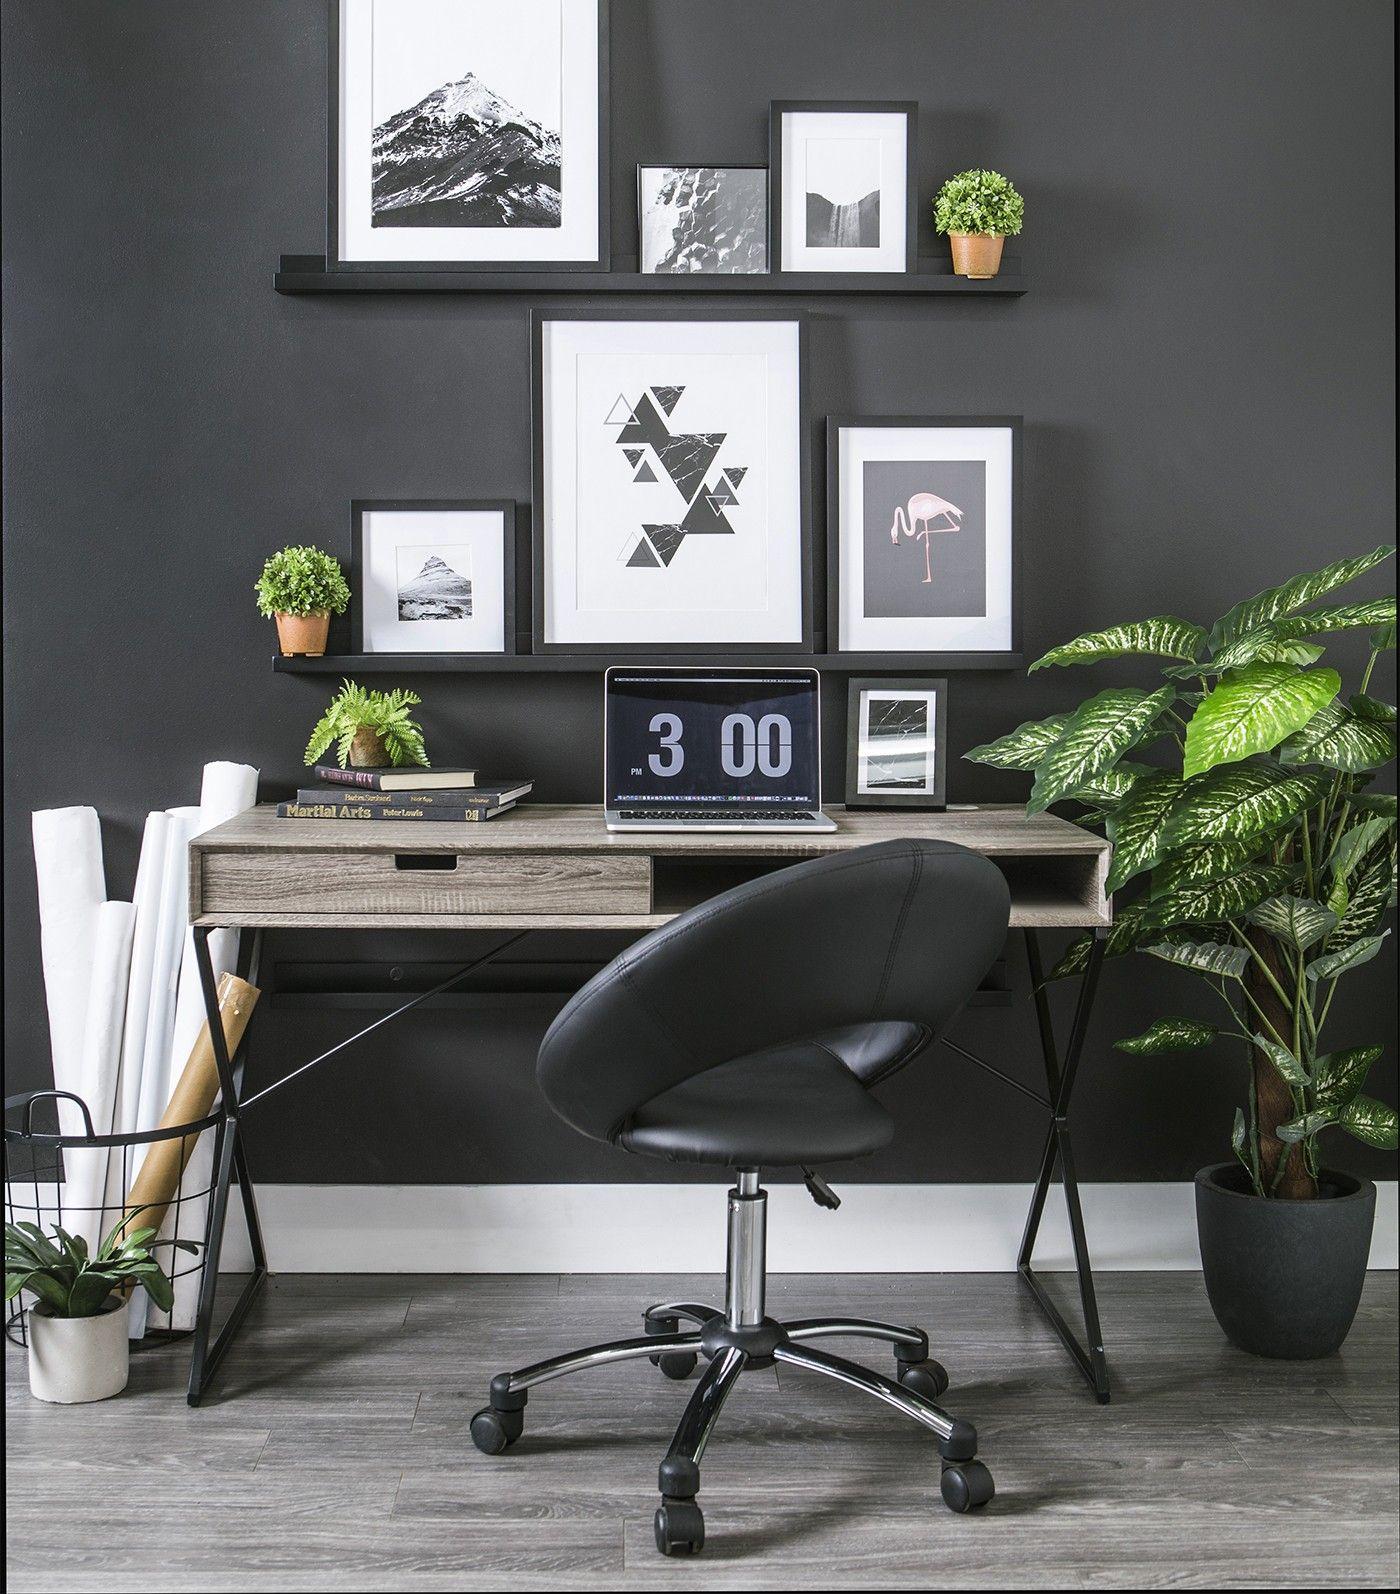 desk chair jysk cotton duck covers askim computer home office pinterest